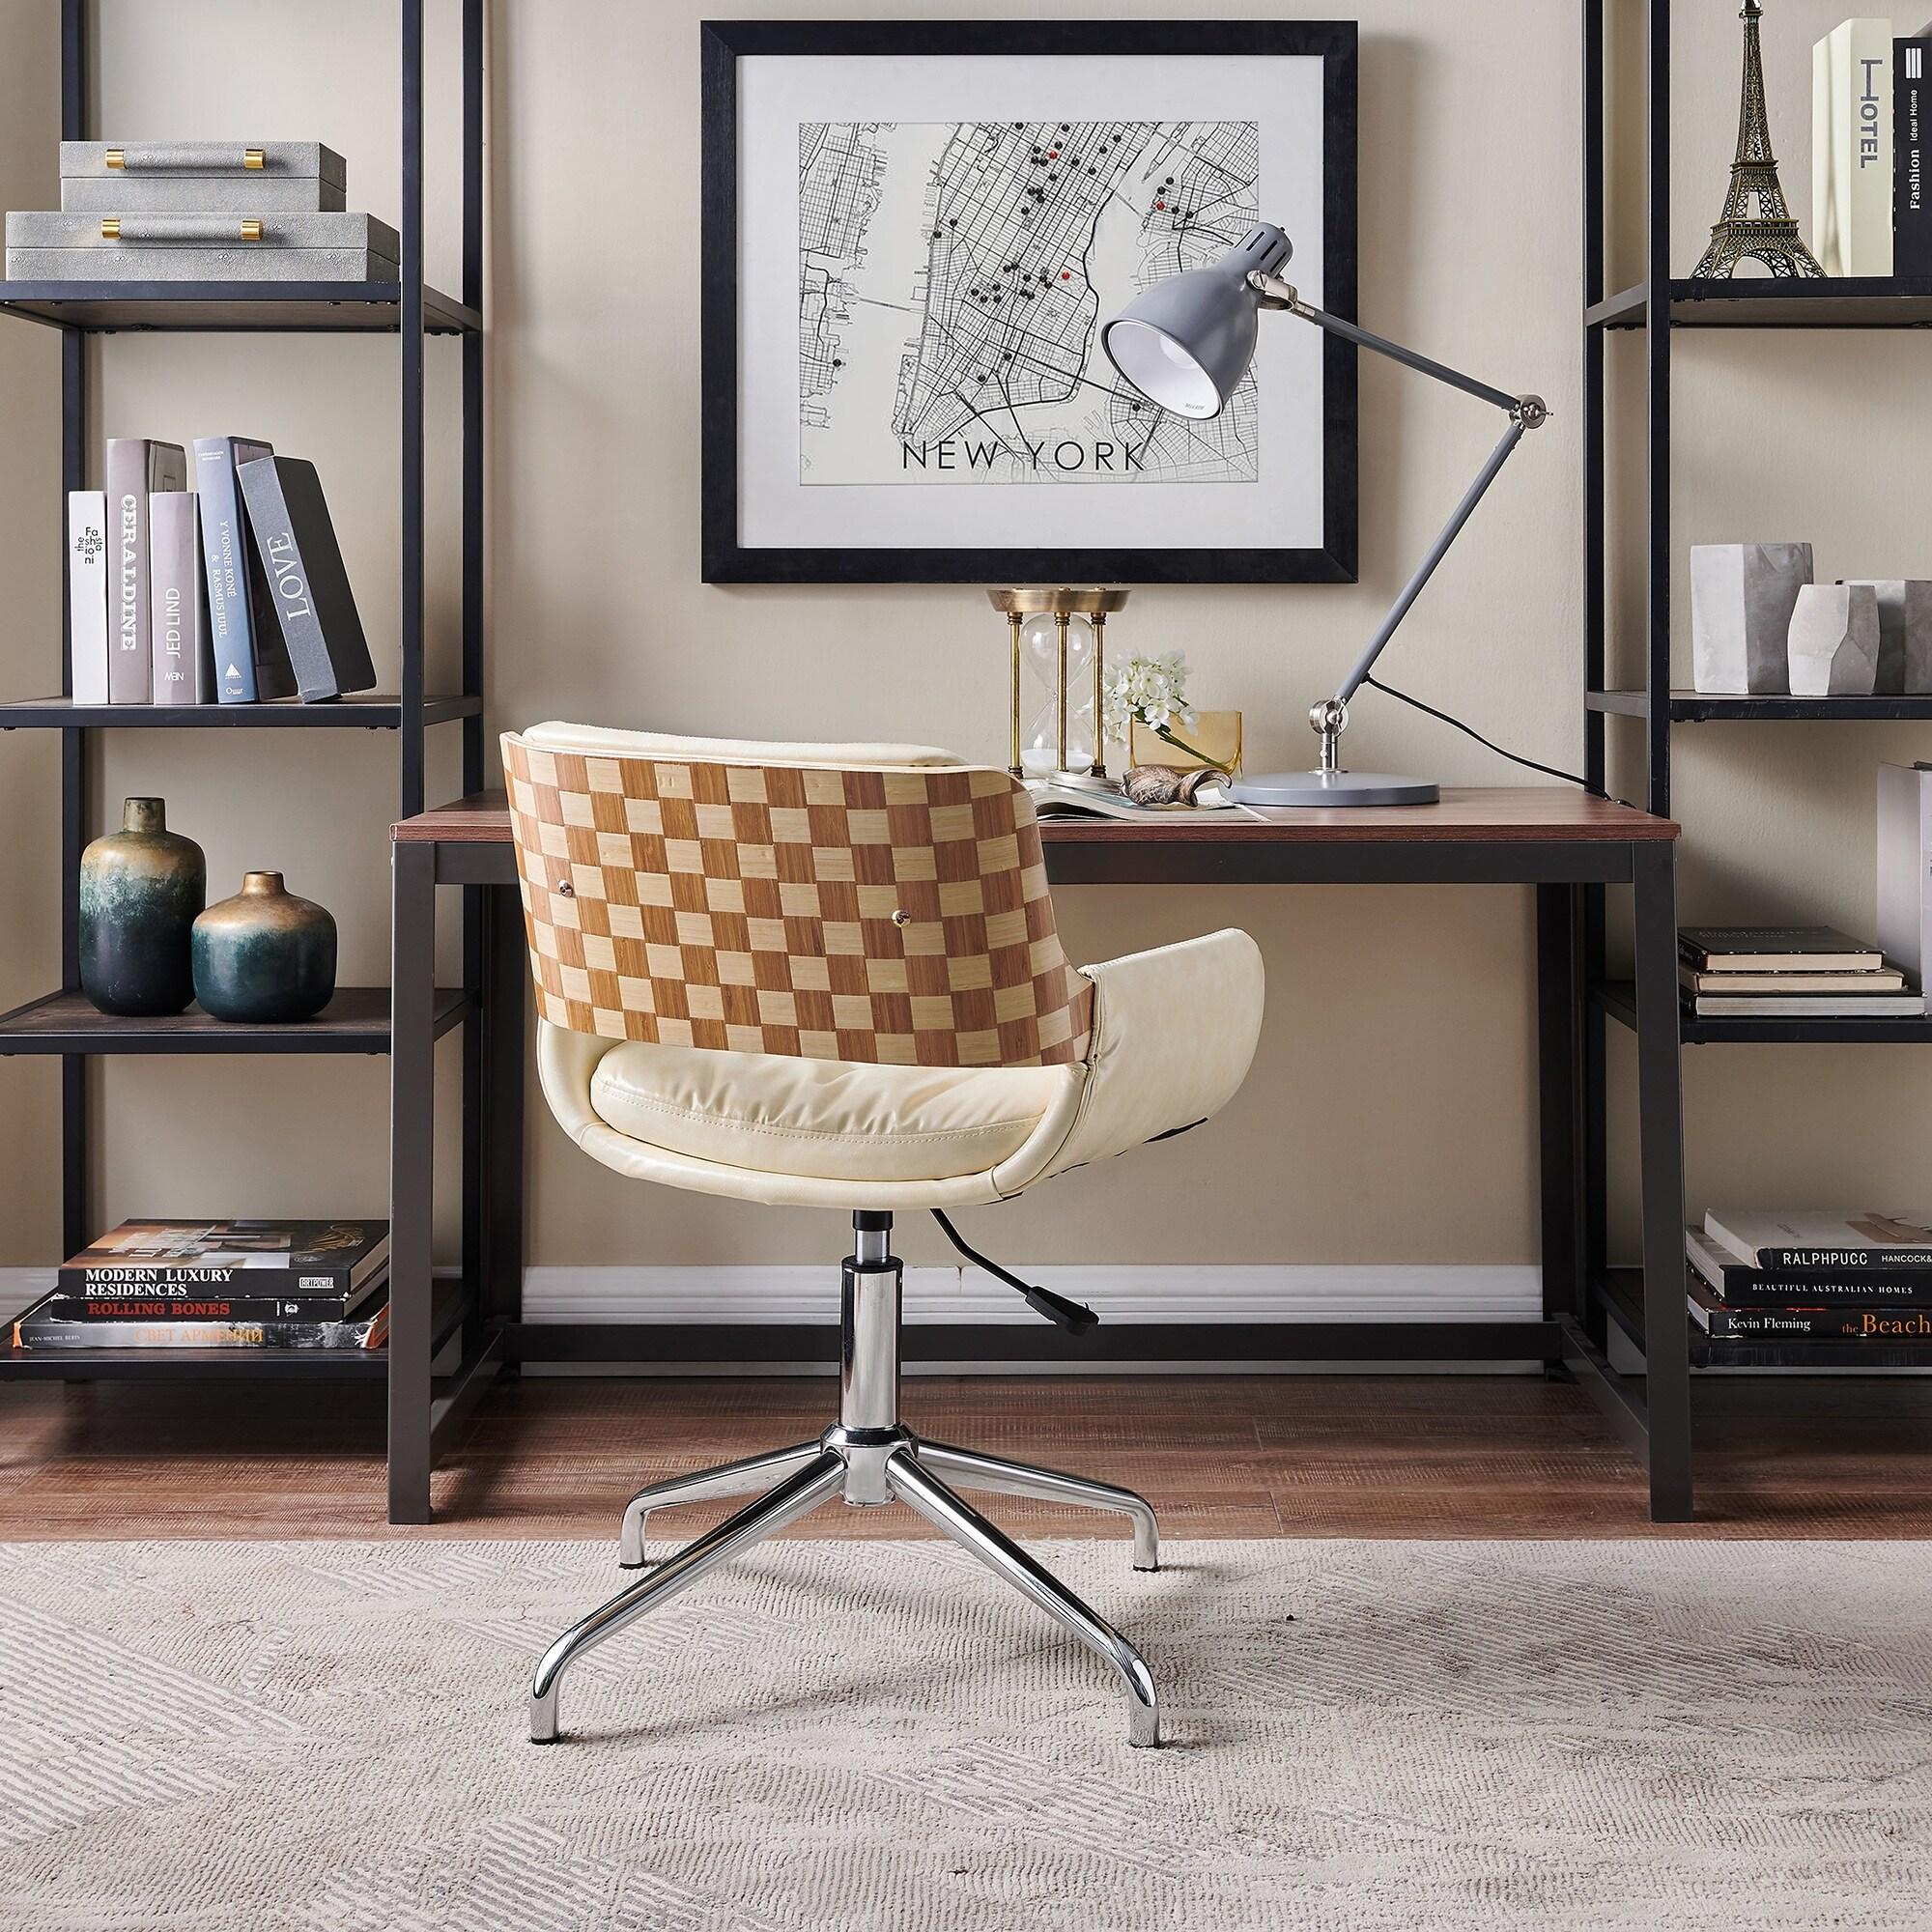 Shop Carbon Loft Nasim Height Adjustable Swivel Accent Home Office Desk Chair Overstock 30668080